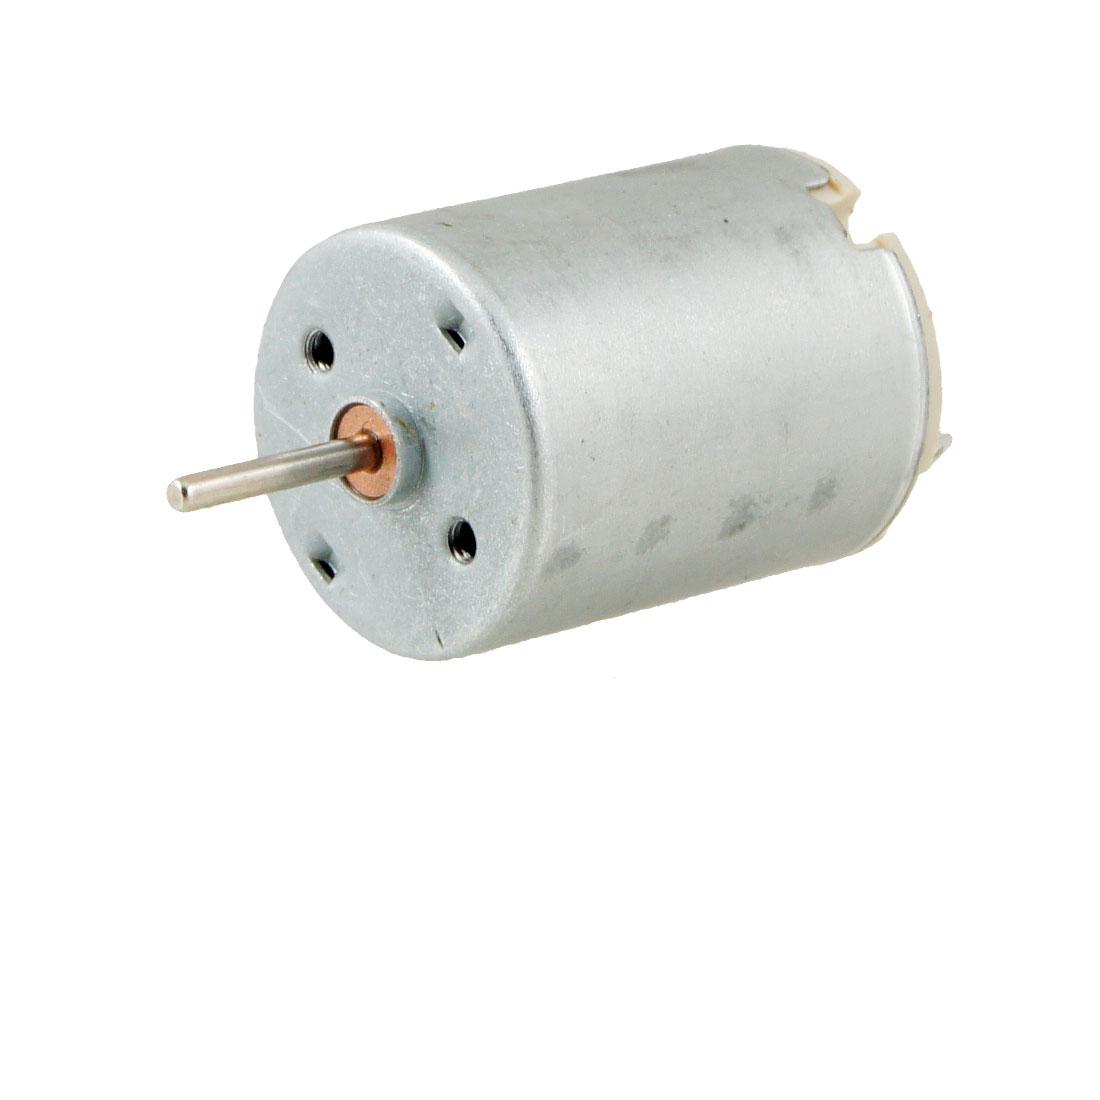 DC 5V 6300RPM 2mm Dia Shaft Metal Housing Magnetic Motor